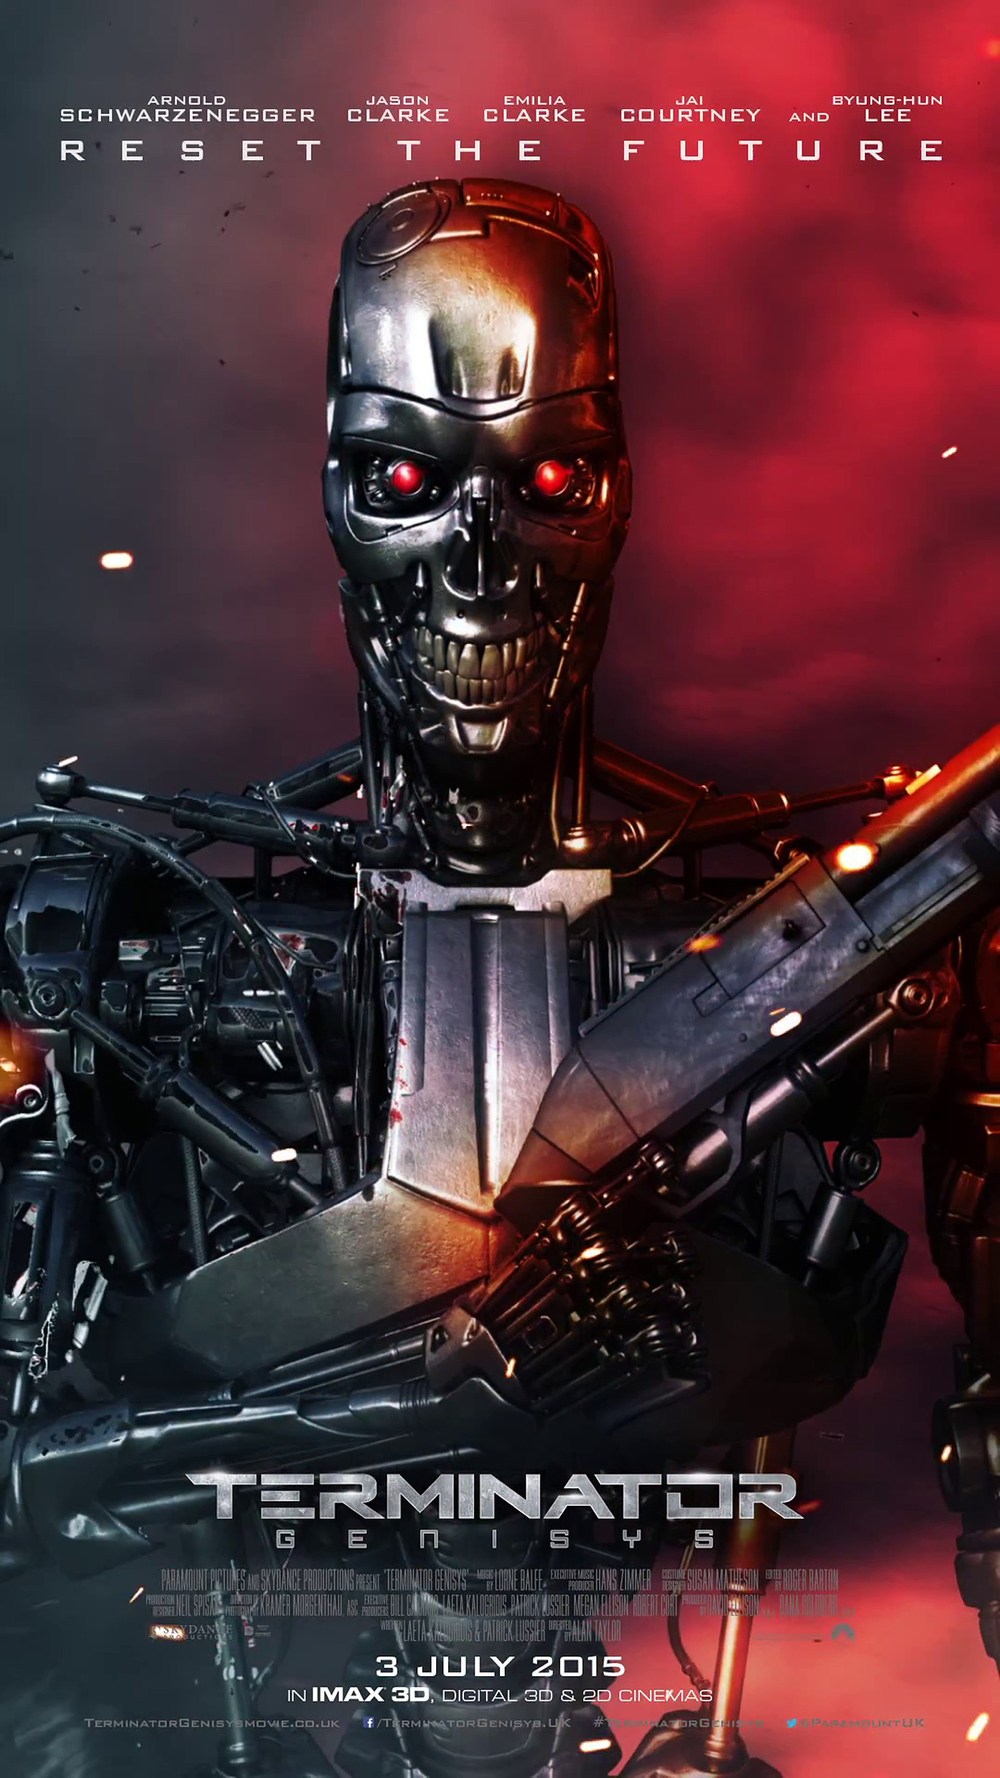 Terminator_genisys_poster_1500x2667_t800.jpg